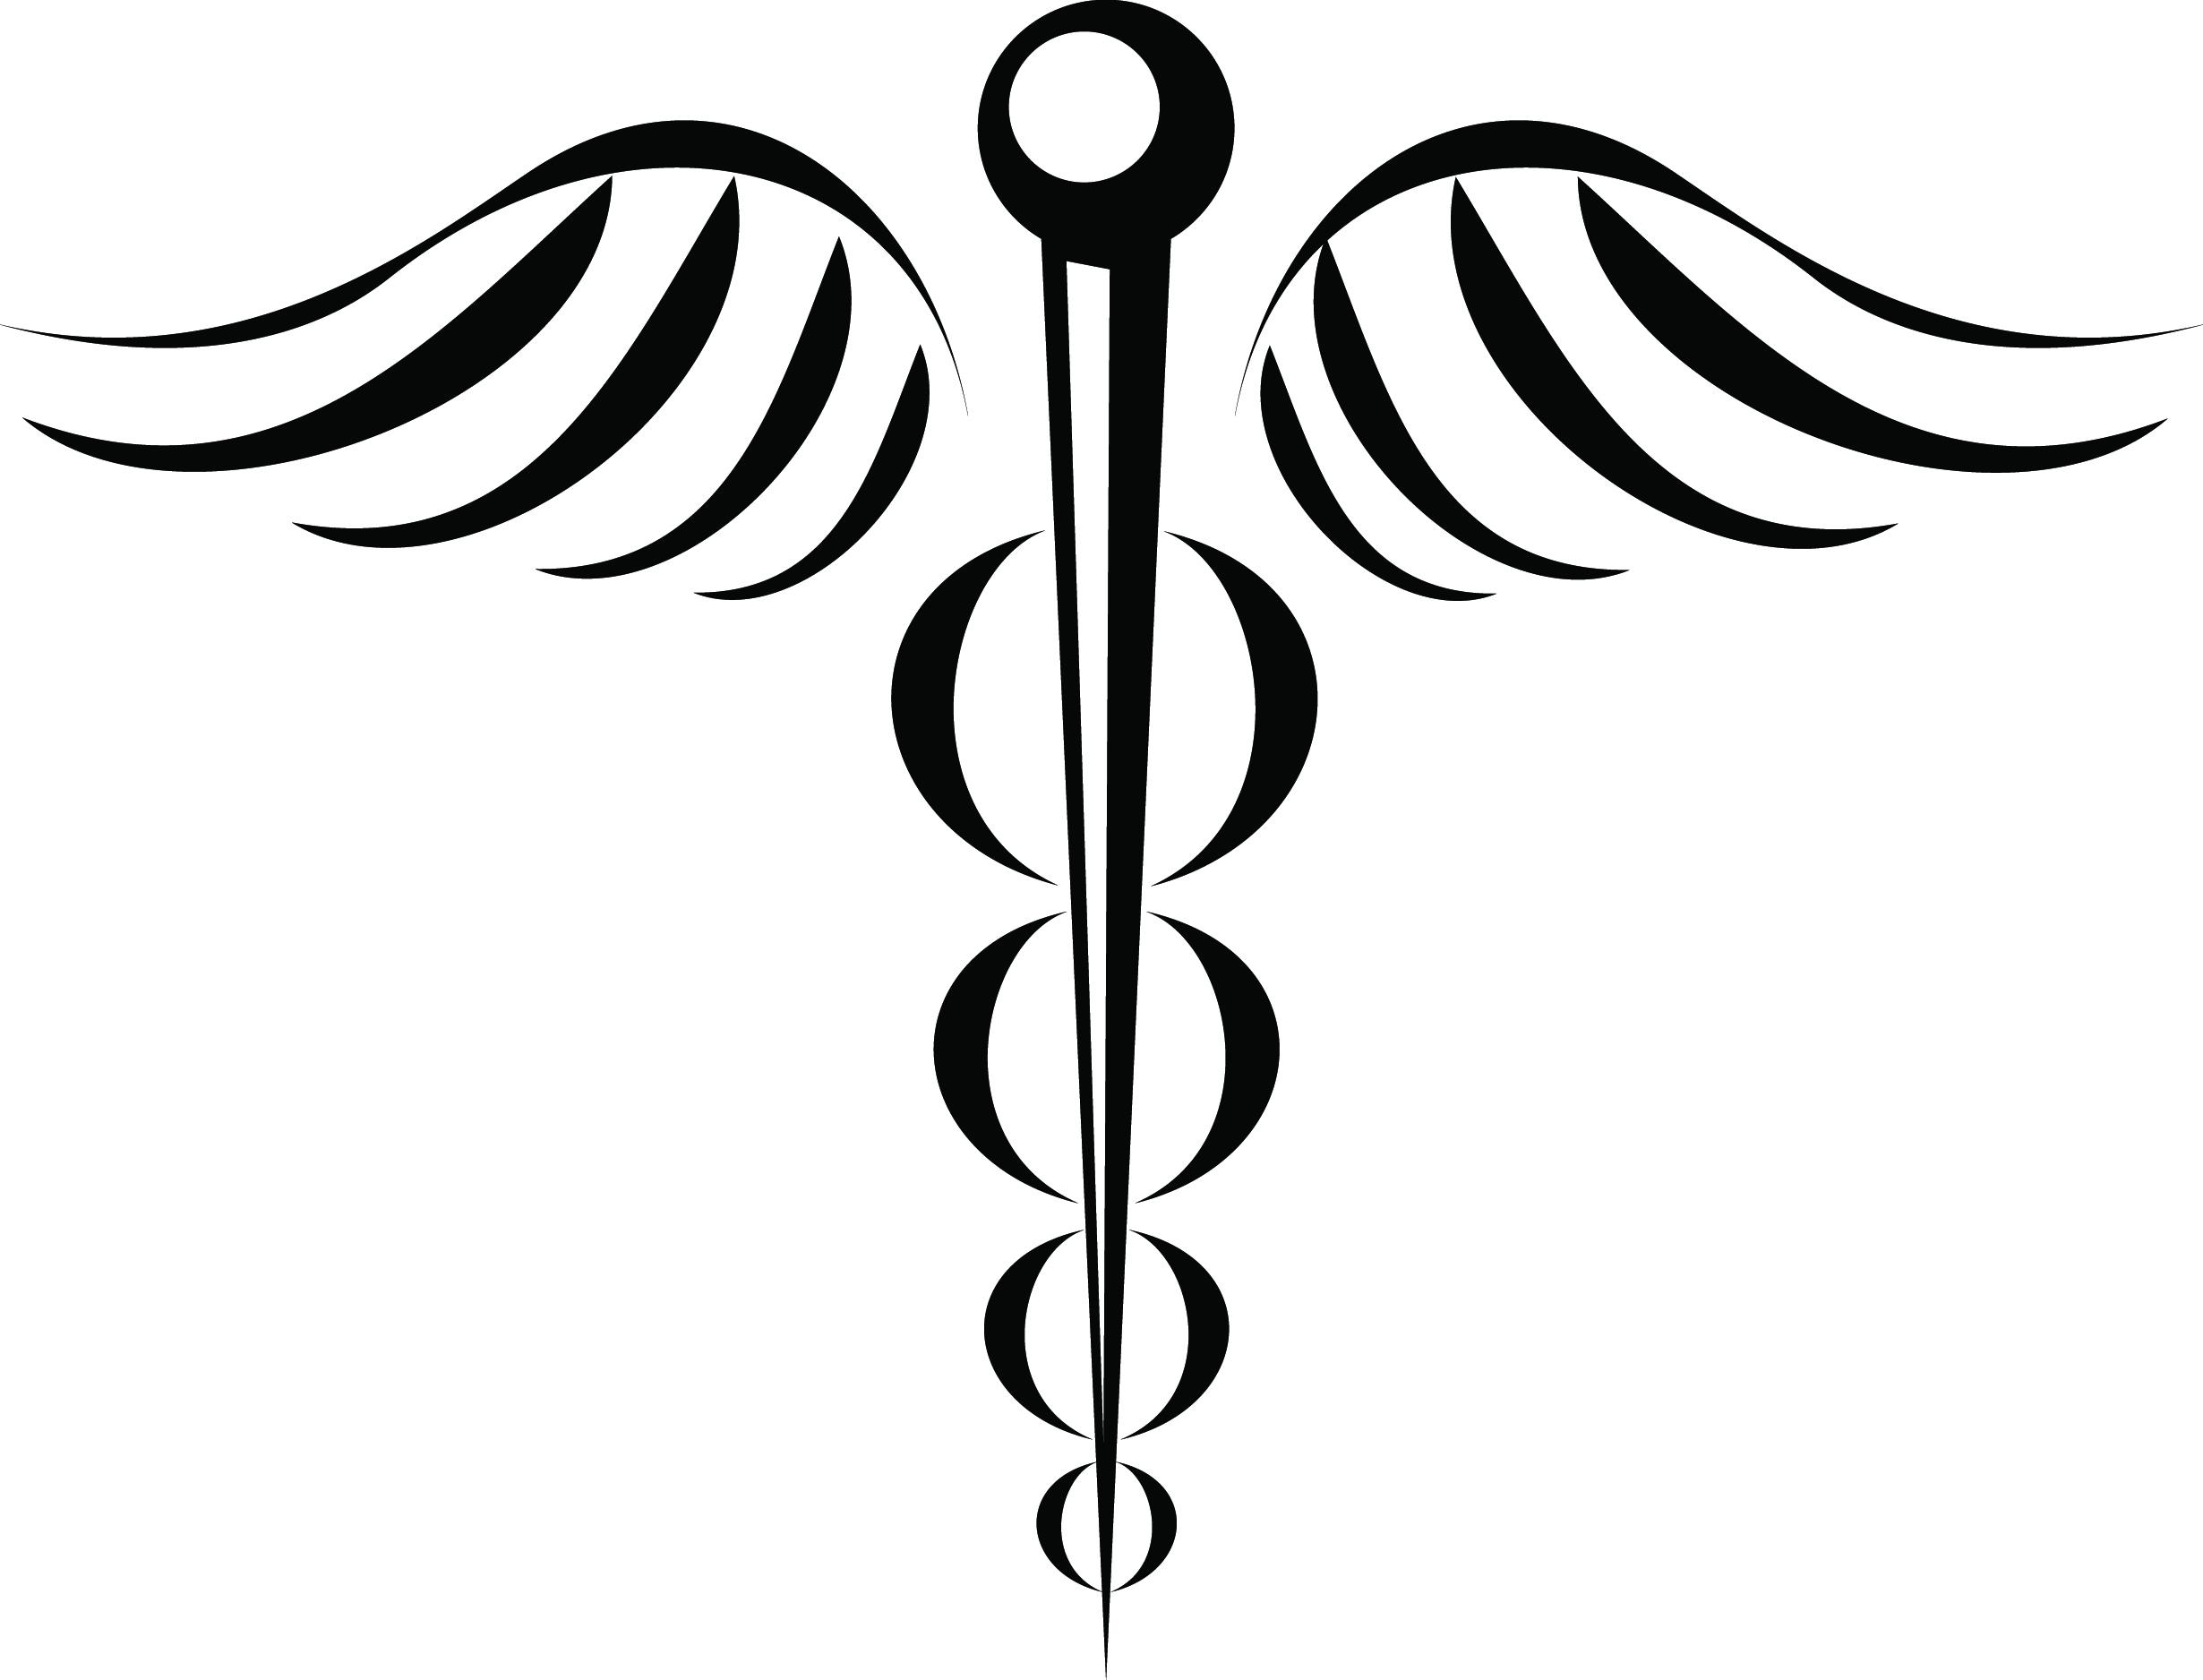 Rn logo clip art image library library Nurse logo clip art - ClipartFest image library library